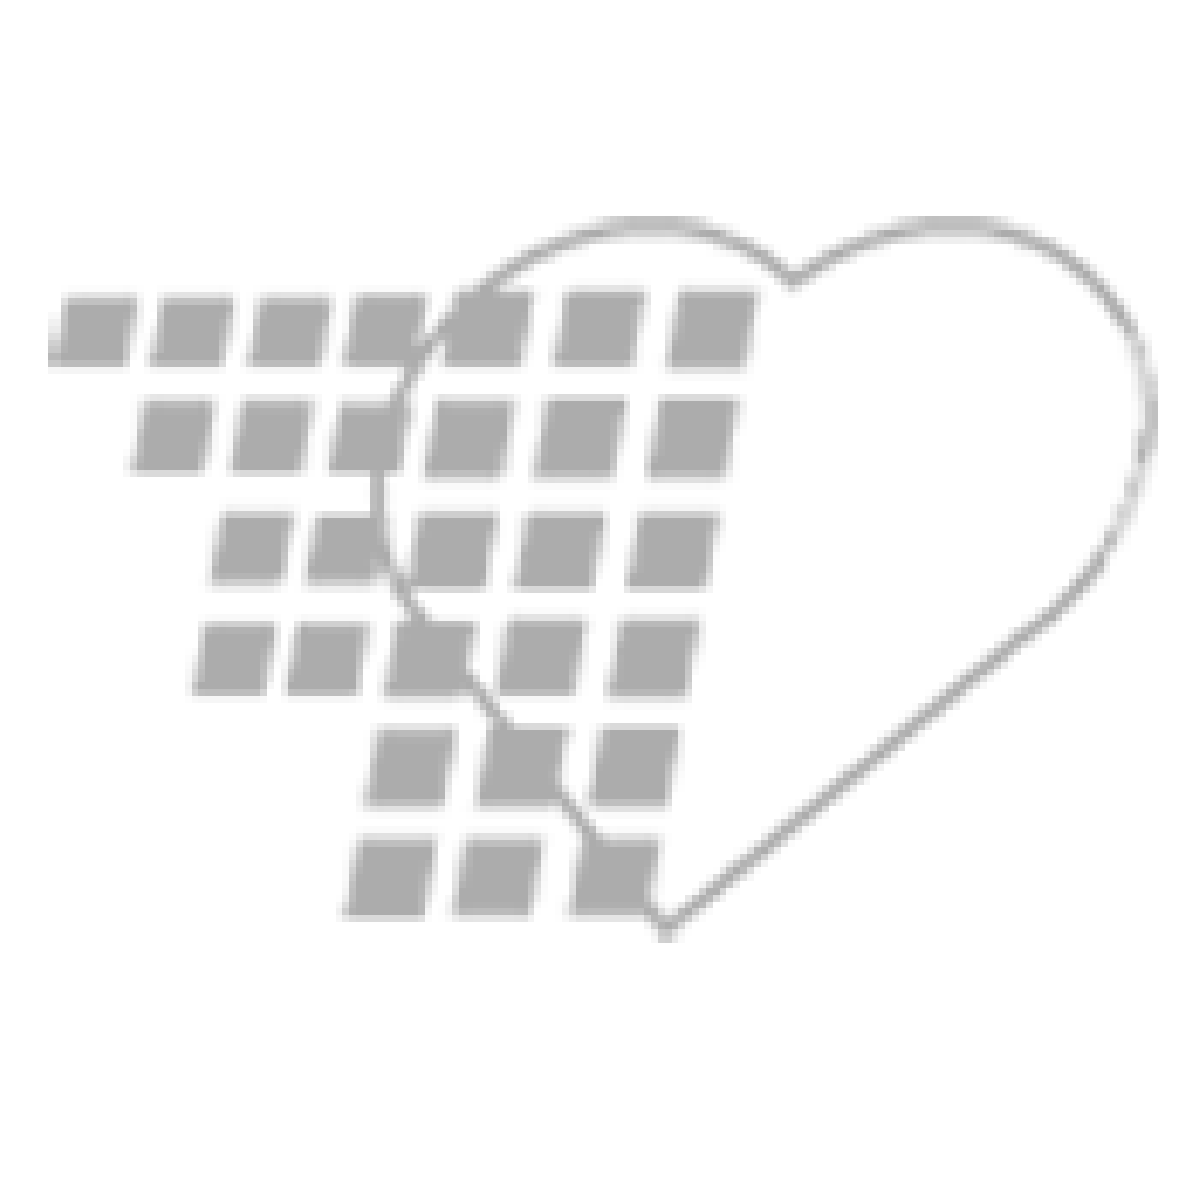 06-93-1394 Demo Dose® Amoxicilln Amoxl 125mg 5mL Suspension 80mL